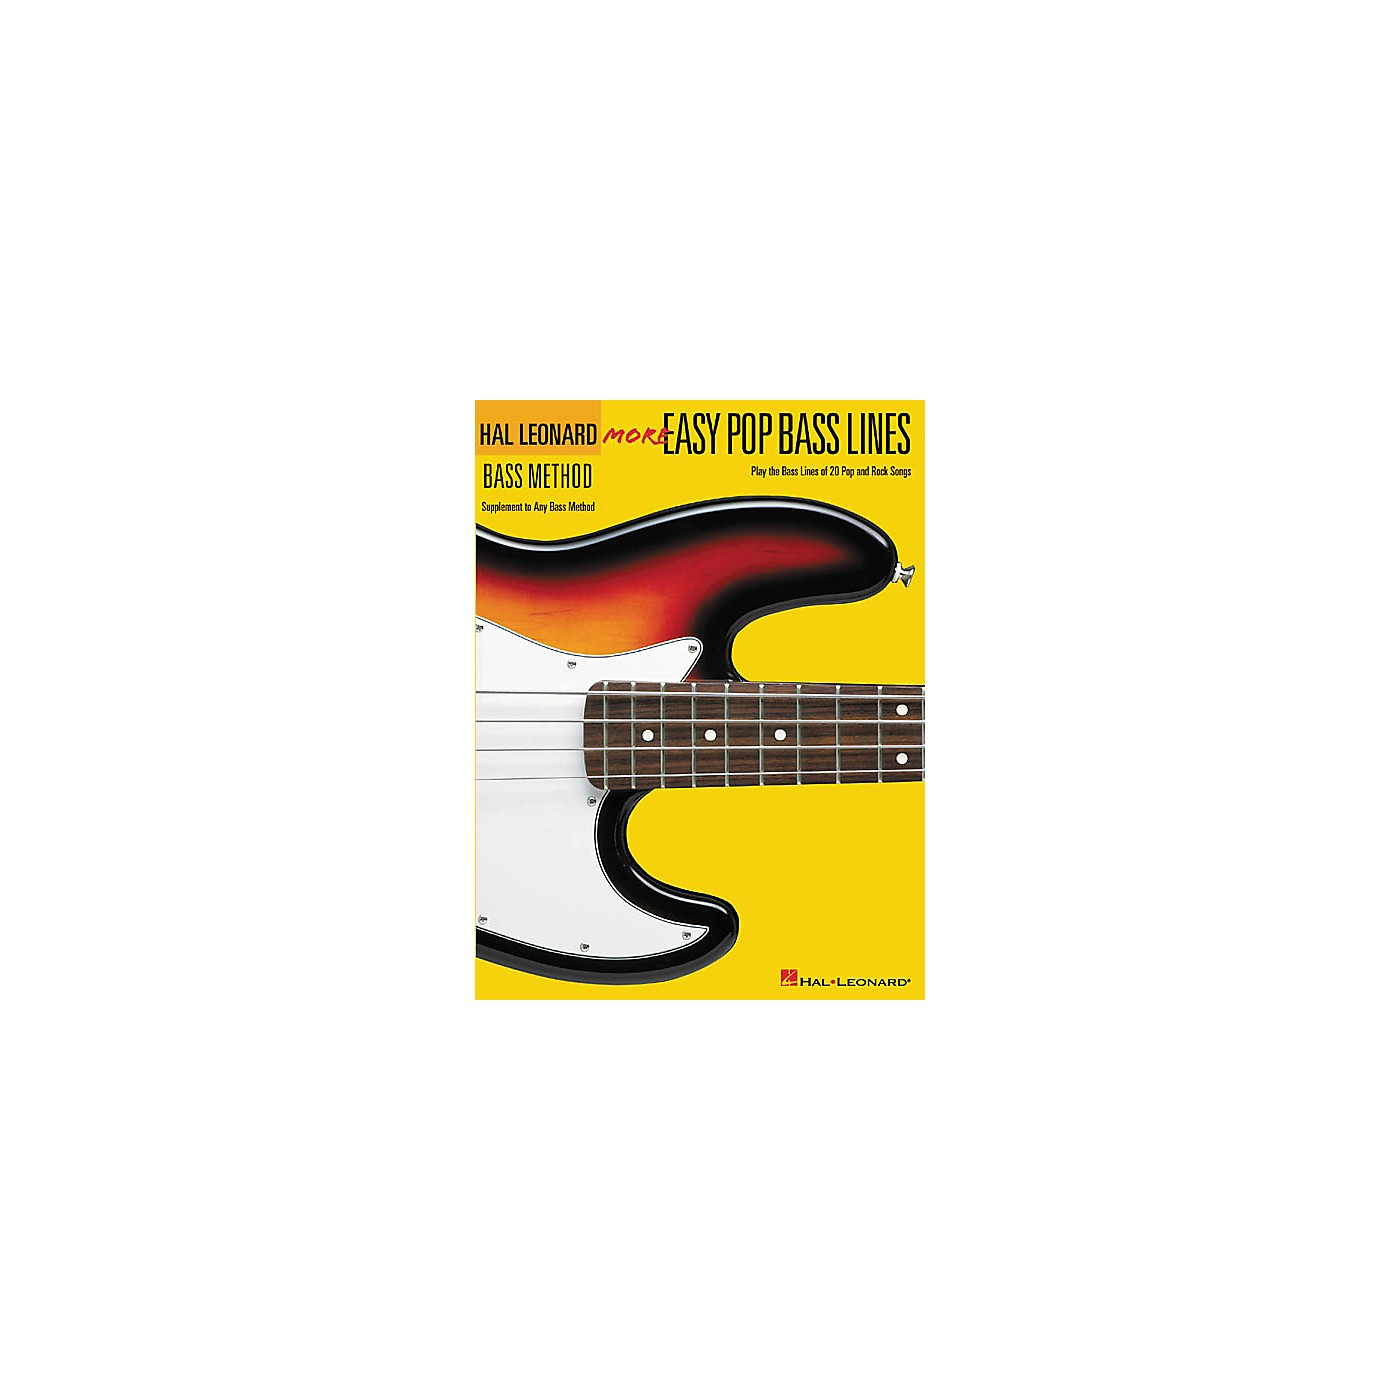 Hal Leonard More Easy Pop Bass Lines Bass Tab Book thumbnail